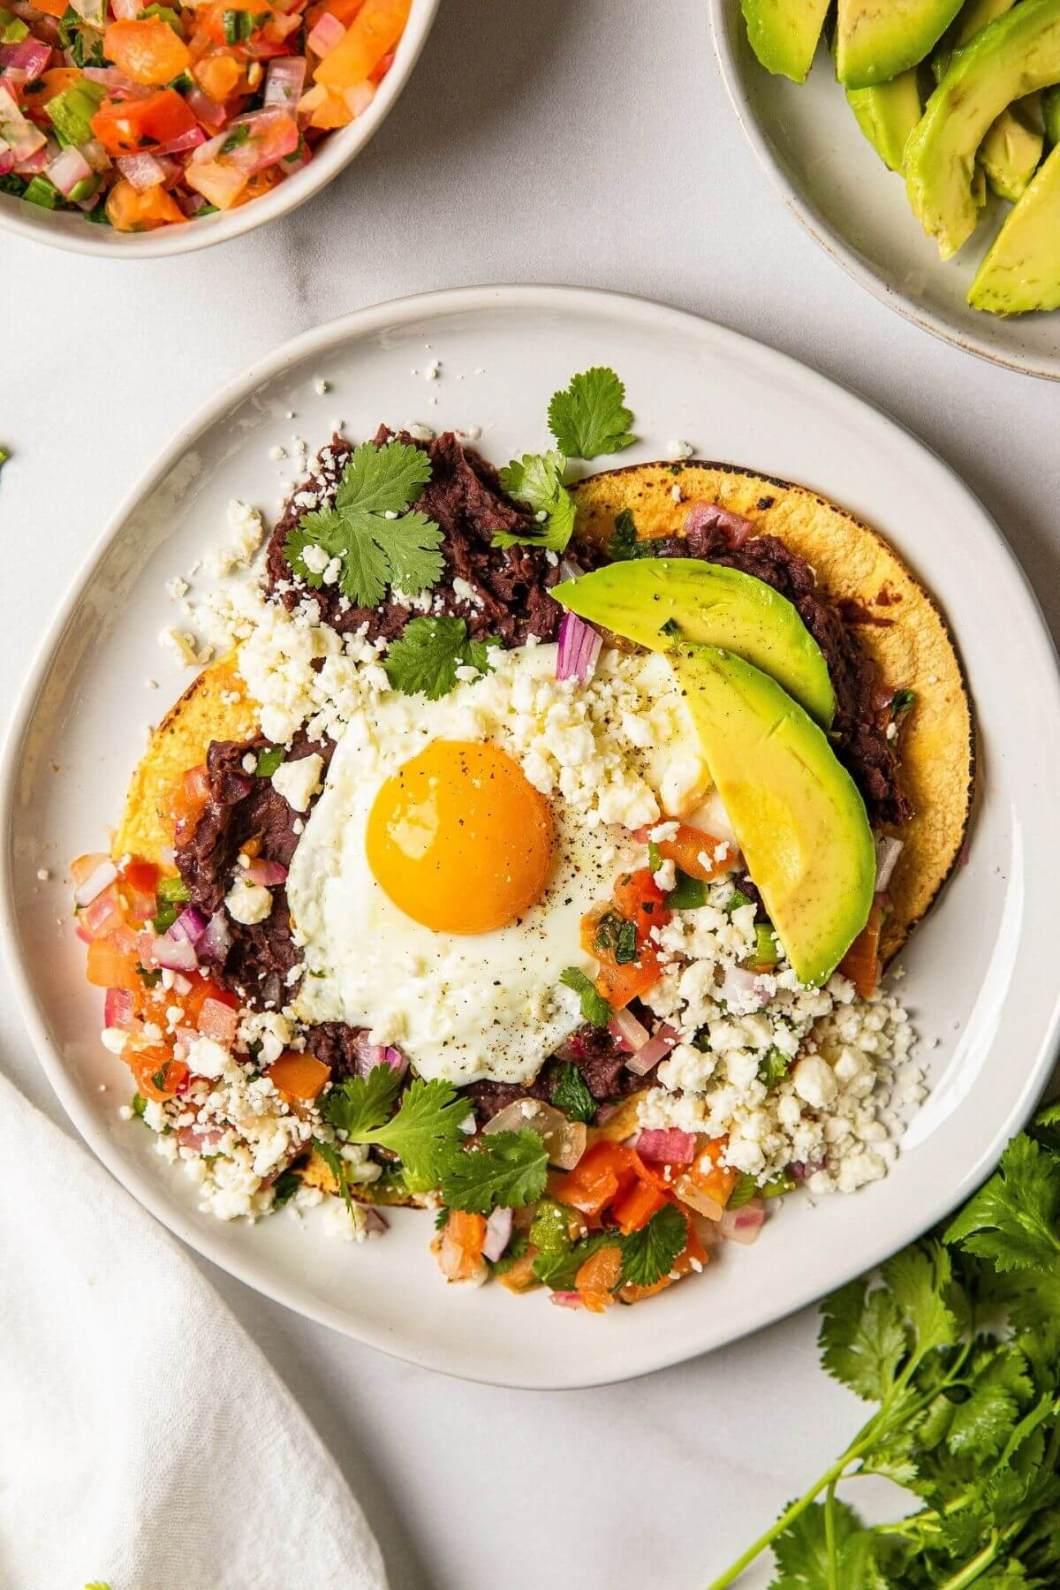 10 minute Mexican huevos ranchos with fried egg and fresh pico de gallo